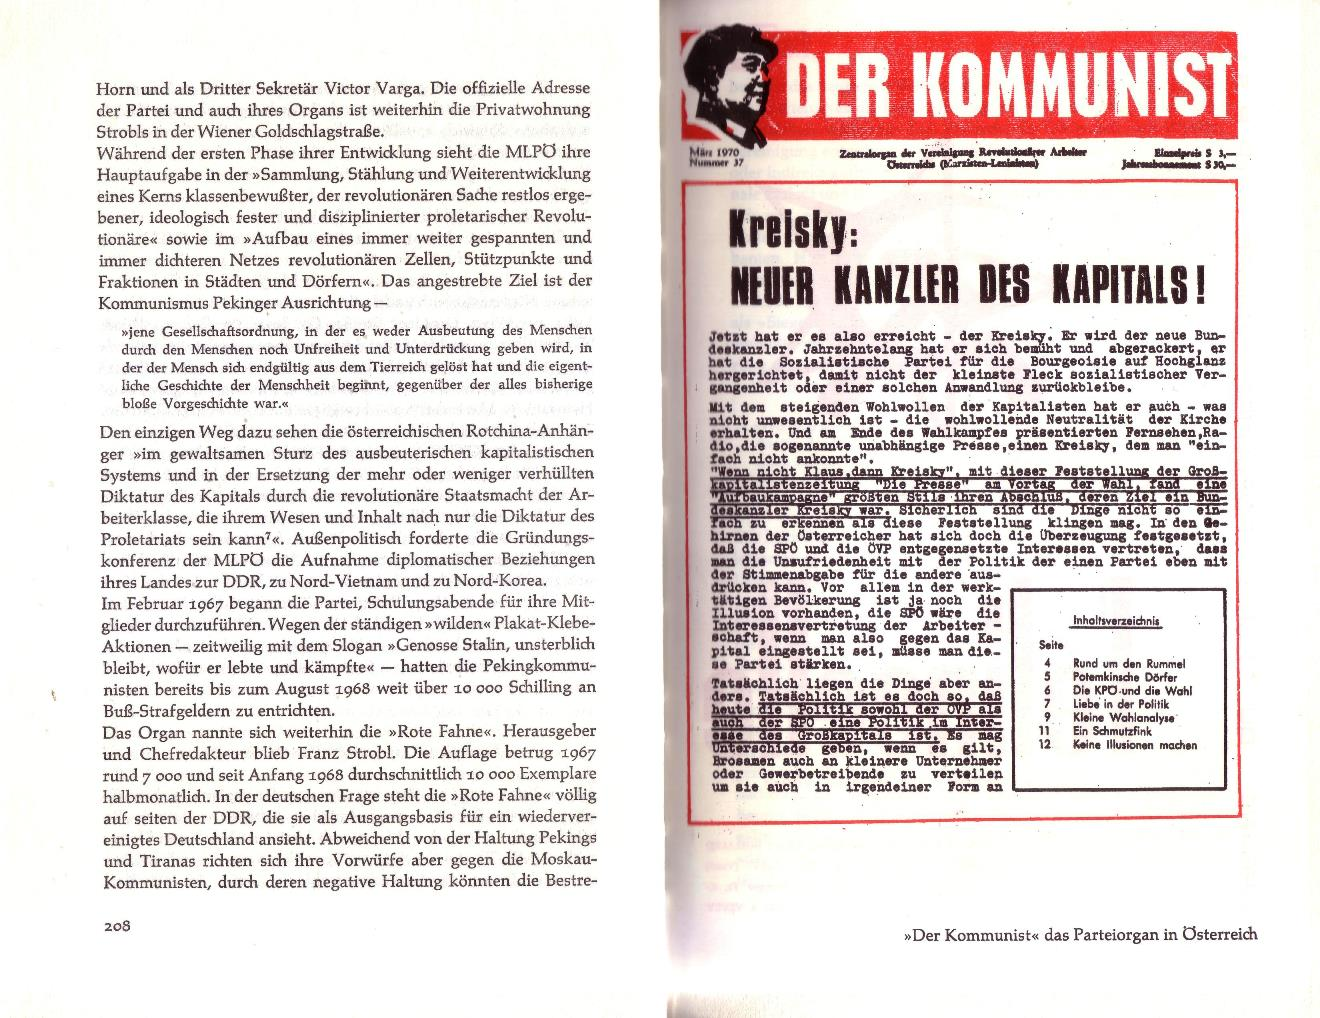 Schlomann_Friedlingstein_Die_Maoisten_0108